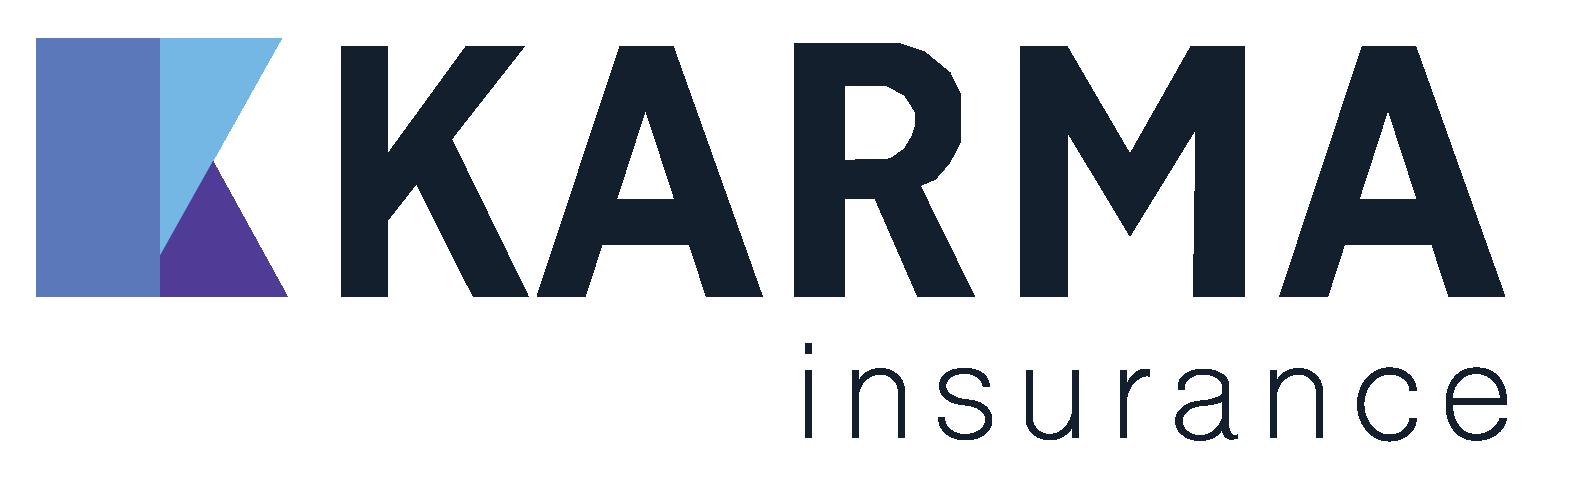 karma-insurance